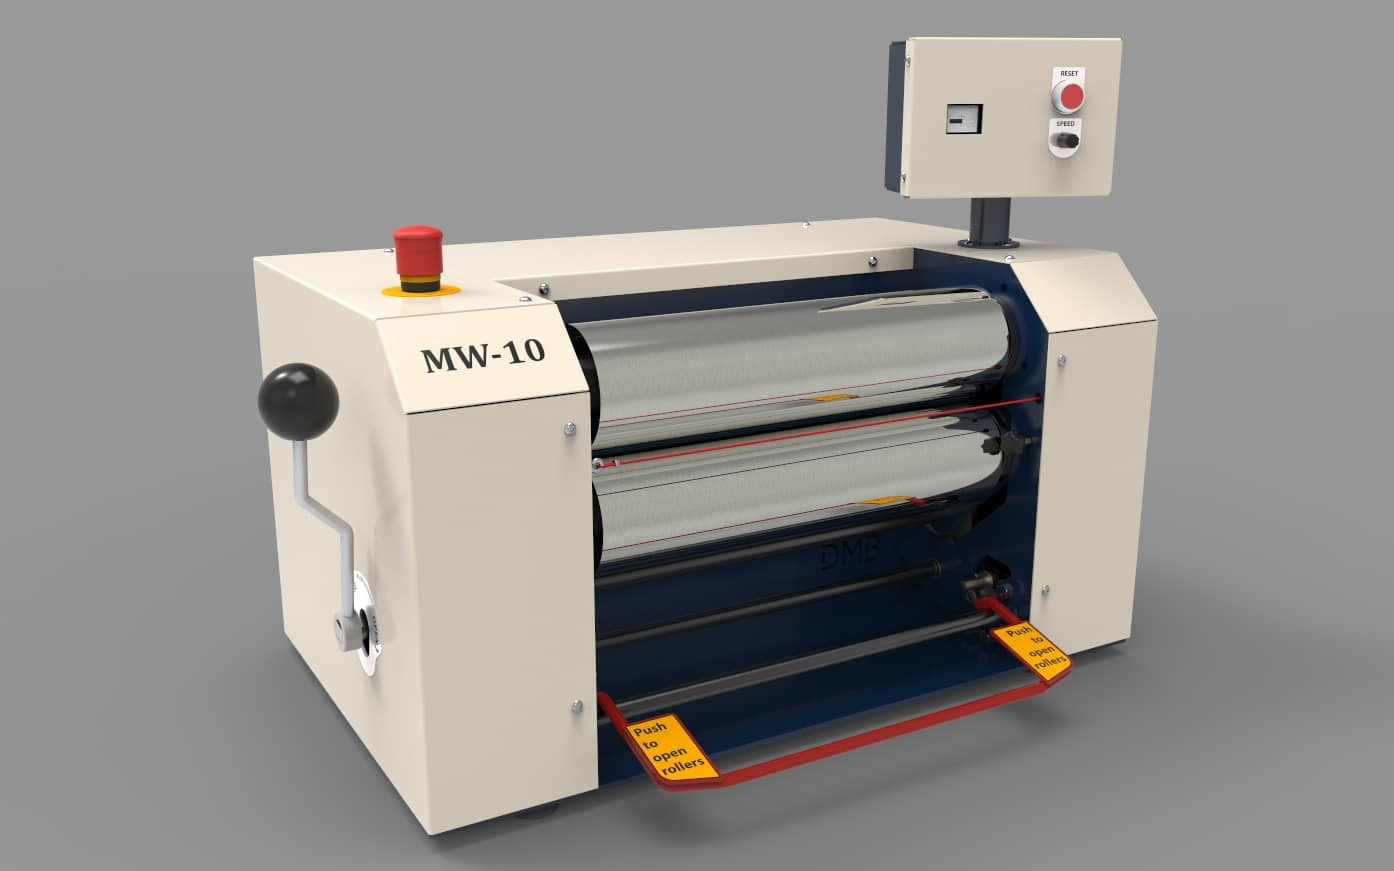 Dijatec siliconenwals mw10 standaard